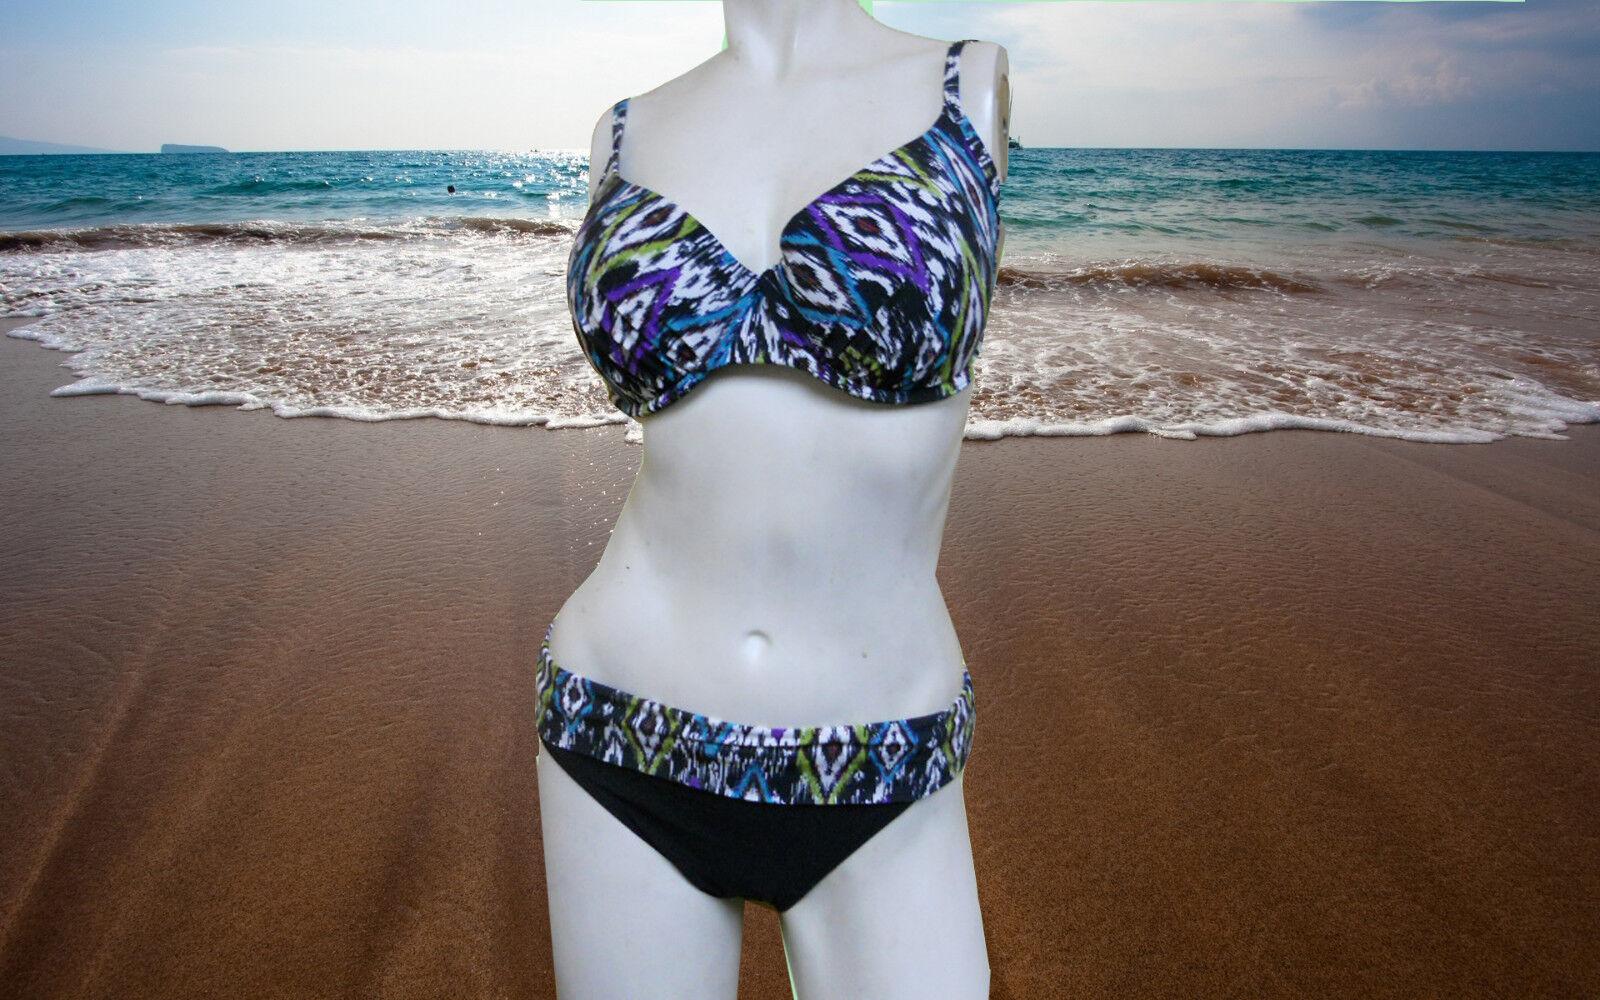 NWT GIDEON OBERSON 2 pc BIKINI 32D 32D 32D Tribal print BATHING SUIT Swimsuit SET - 6 b2843d